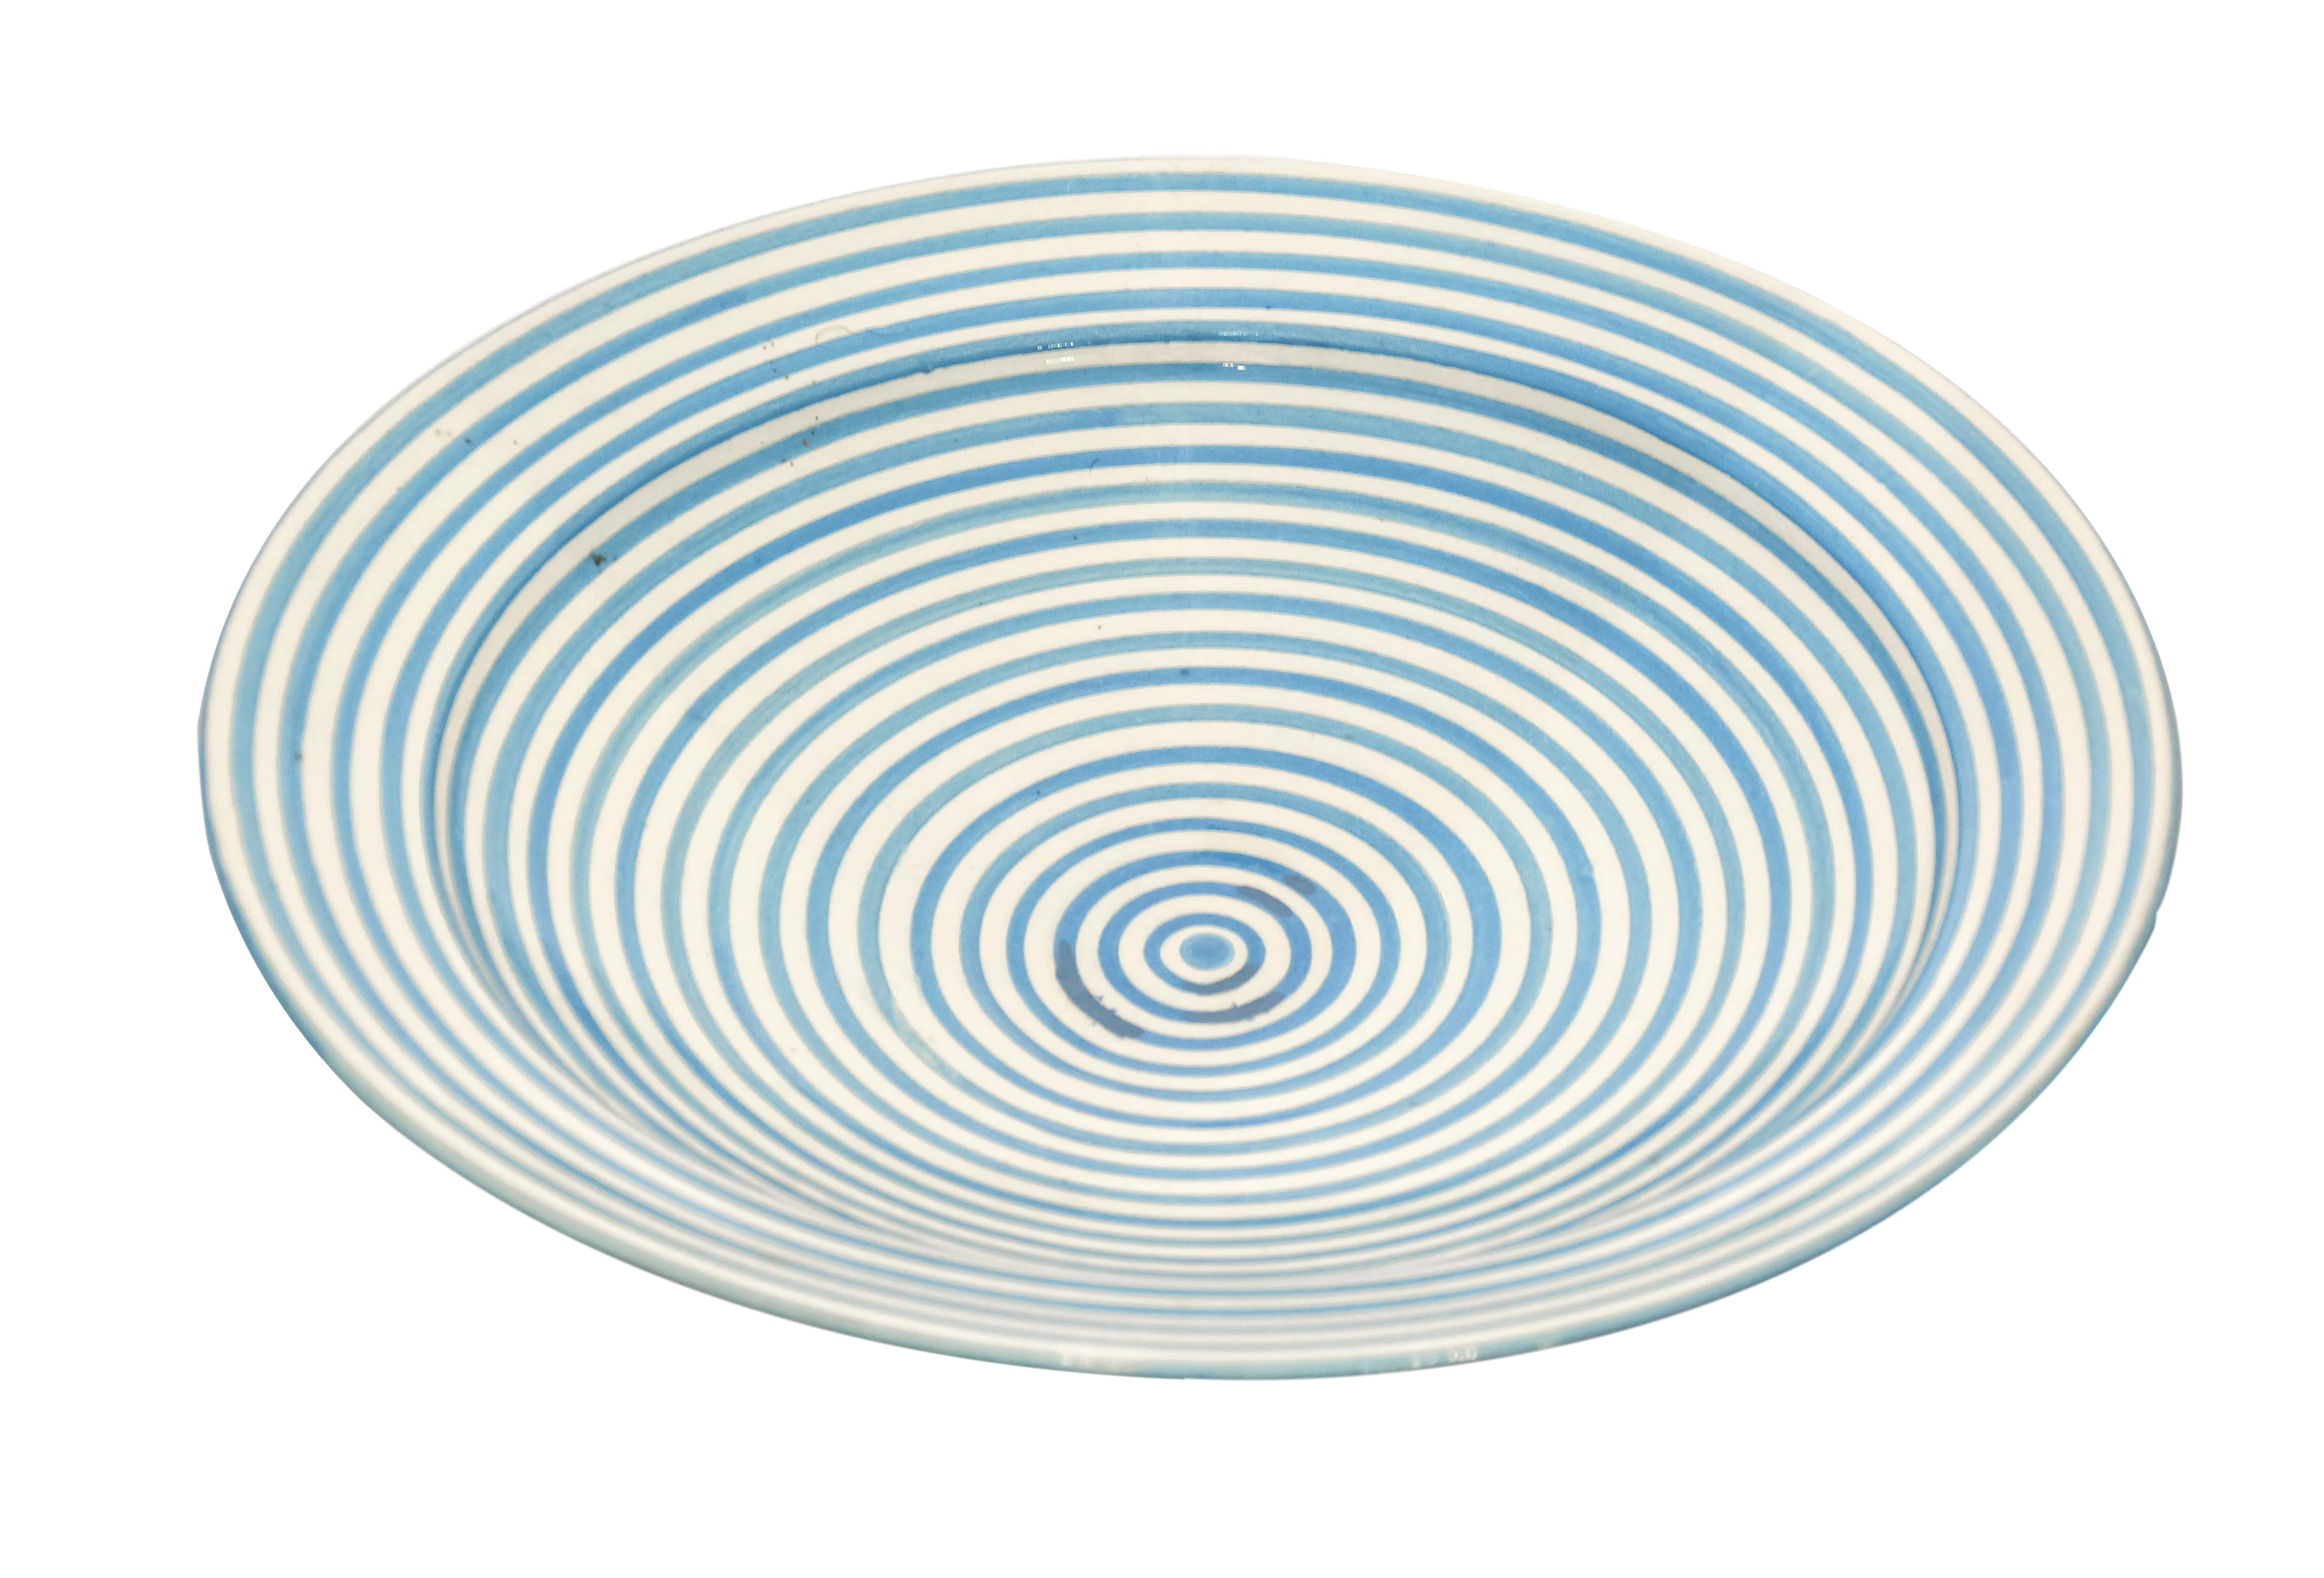 Moroccan Blue Spiral Dish, 27 Cm